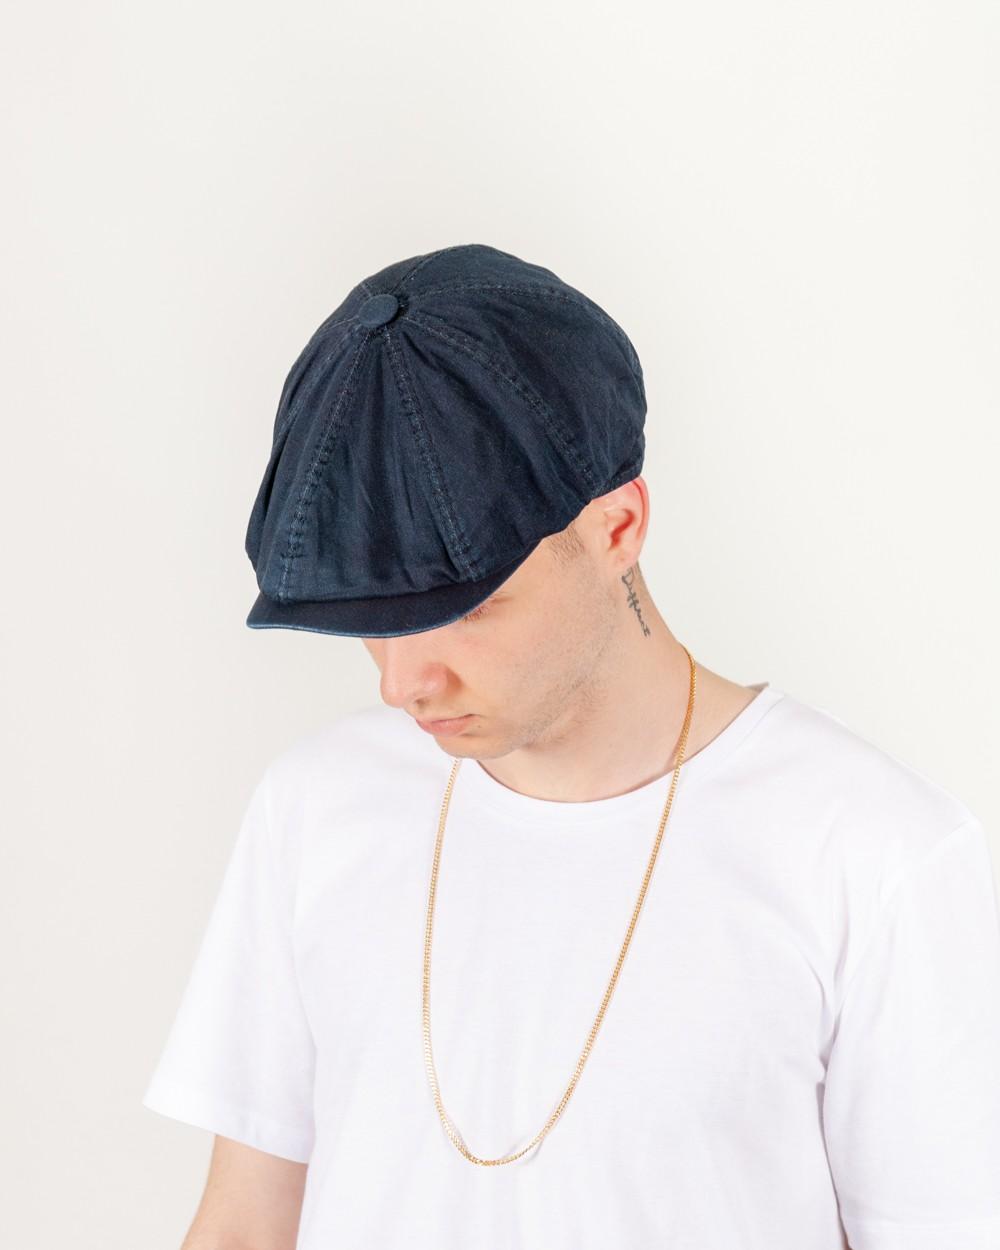 ŞAPKA - Gosh - David Beckham Kasket Şapka FNT500LC